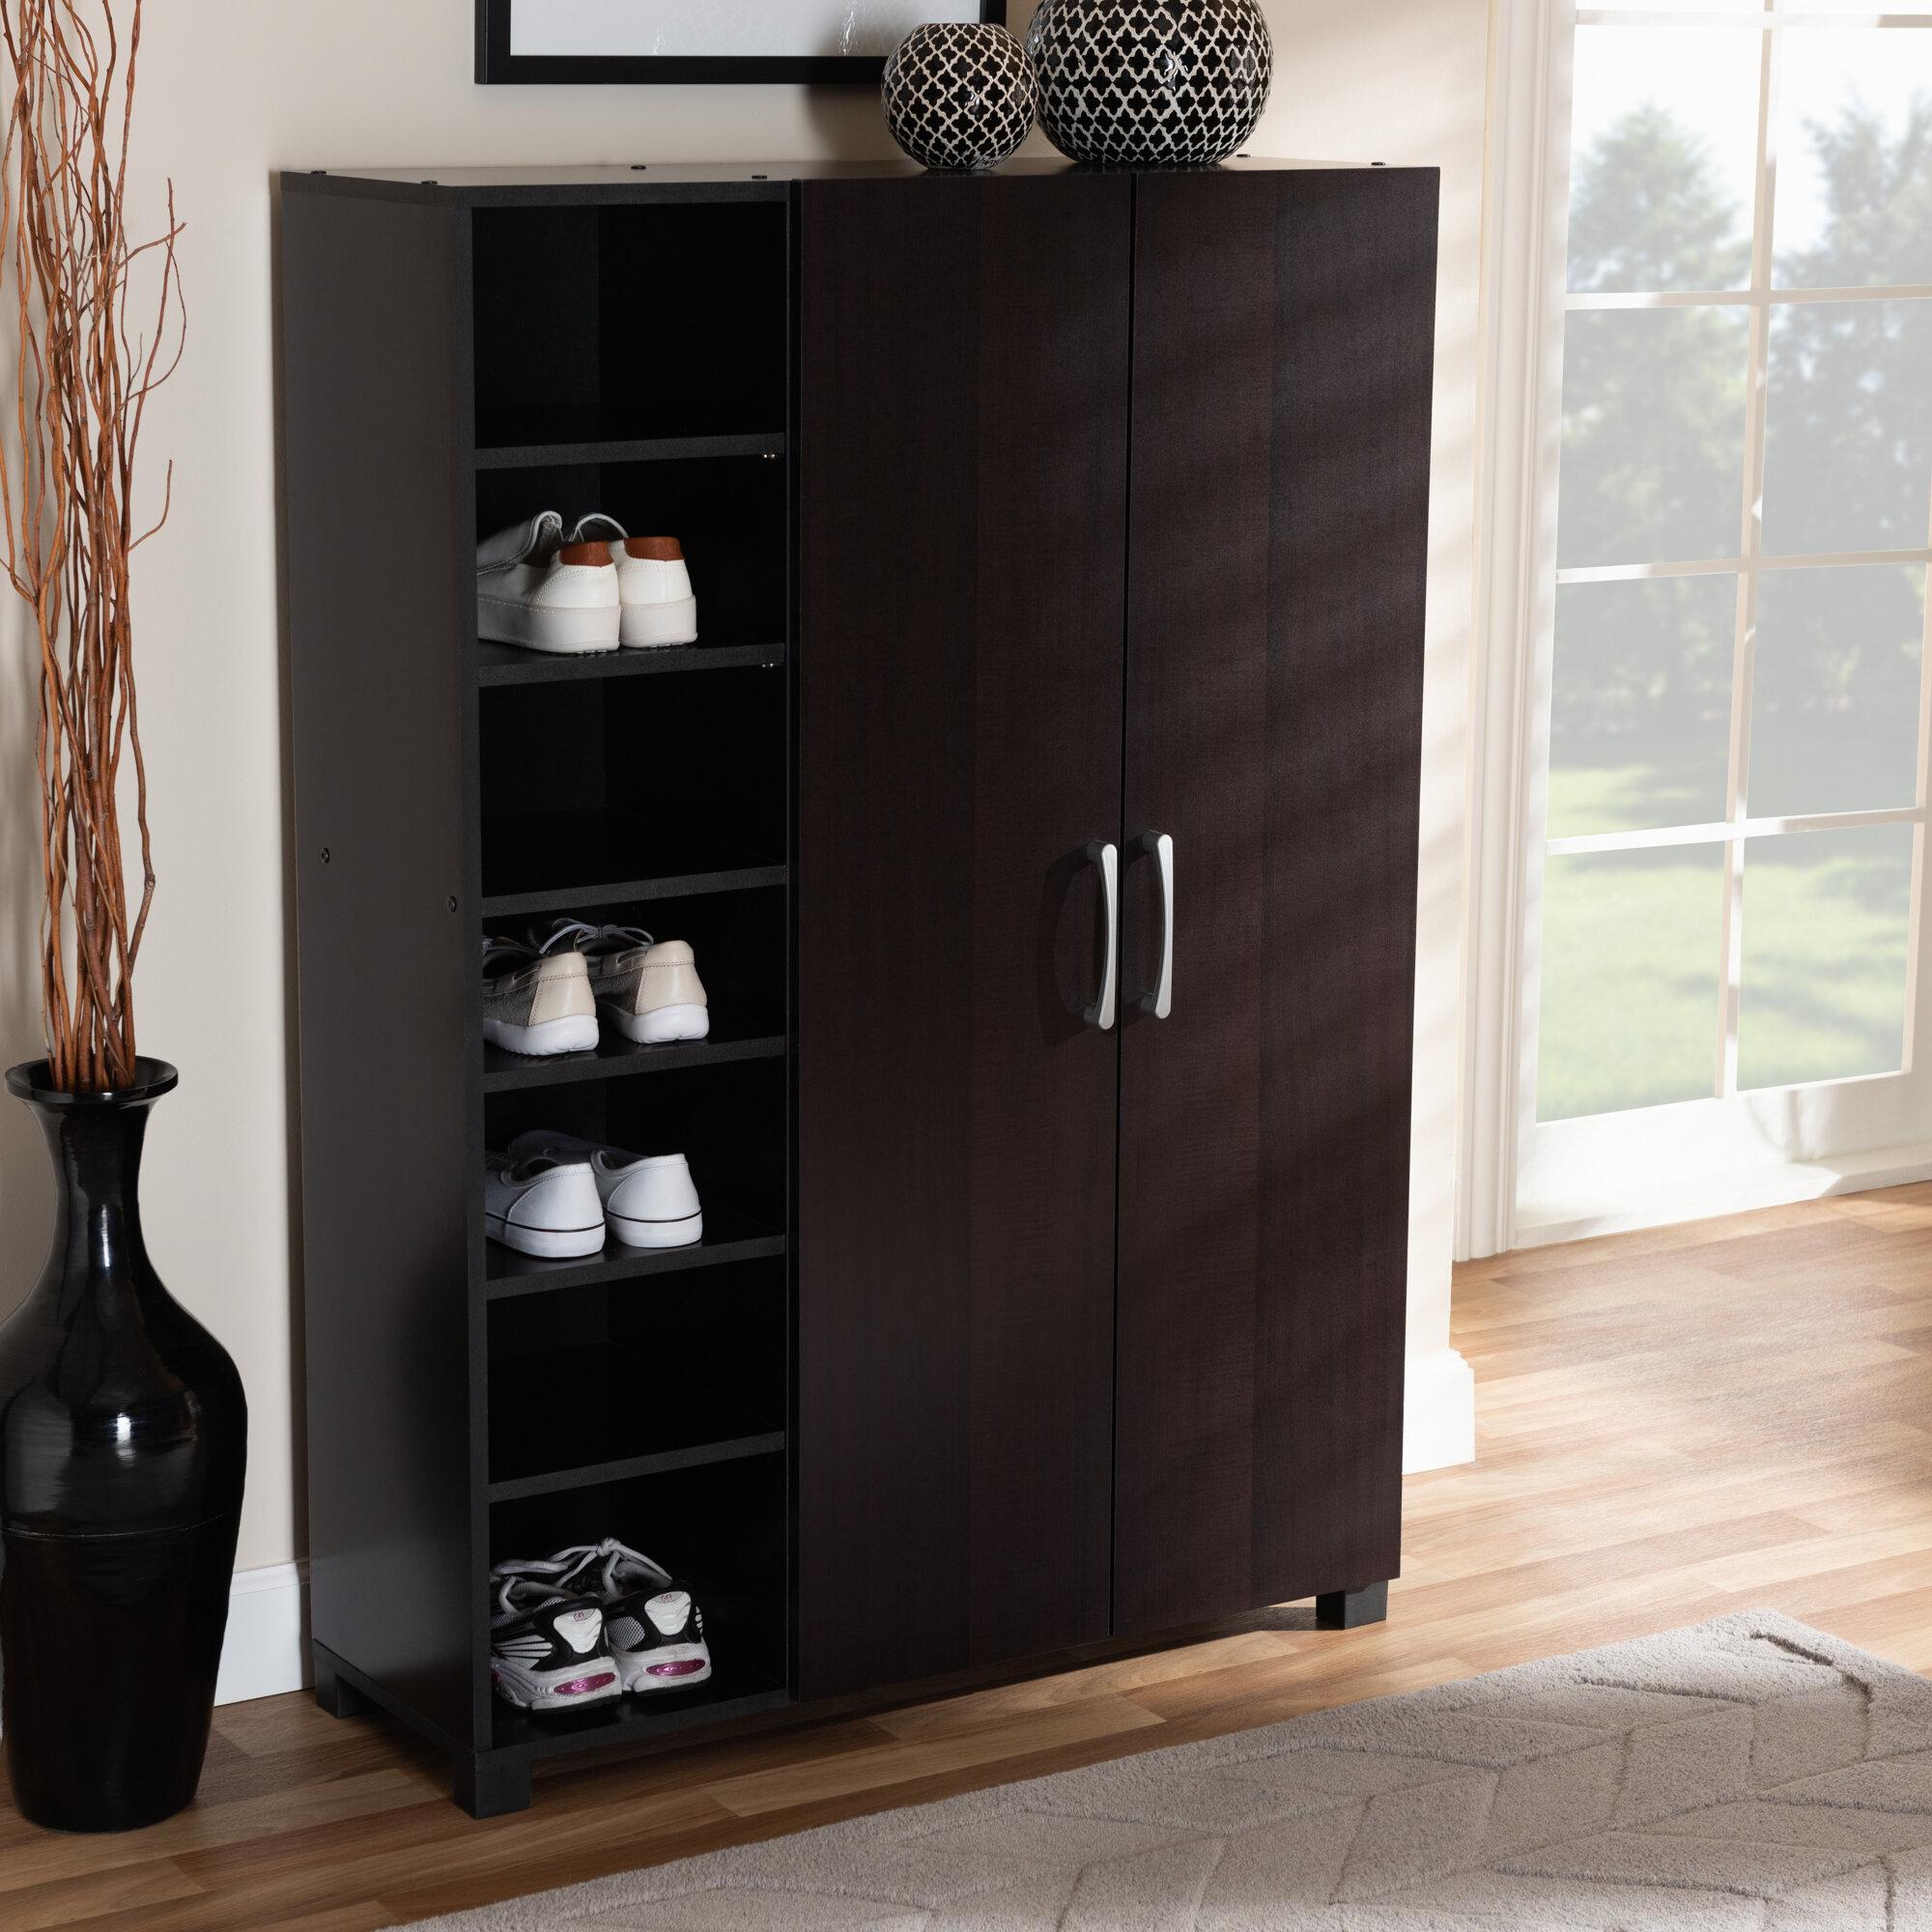 Ebern Designs 2 Door Wood Entryway 19 Pair Shoe Storage Cabinet Wayfair